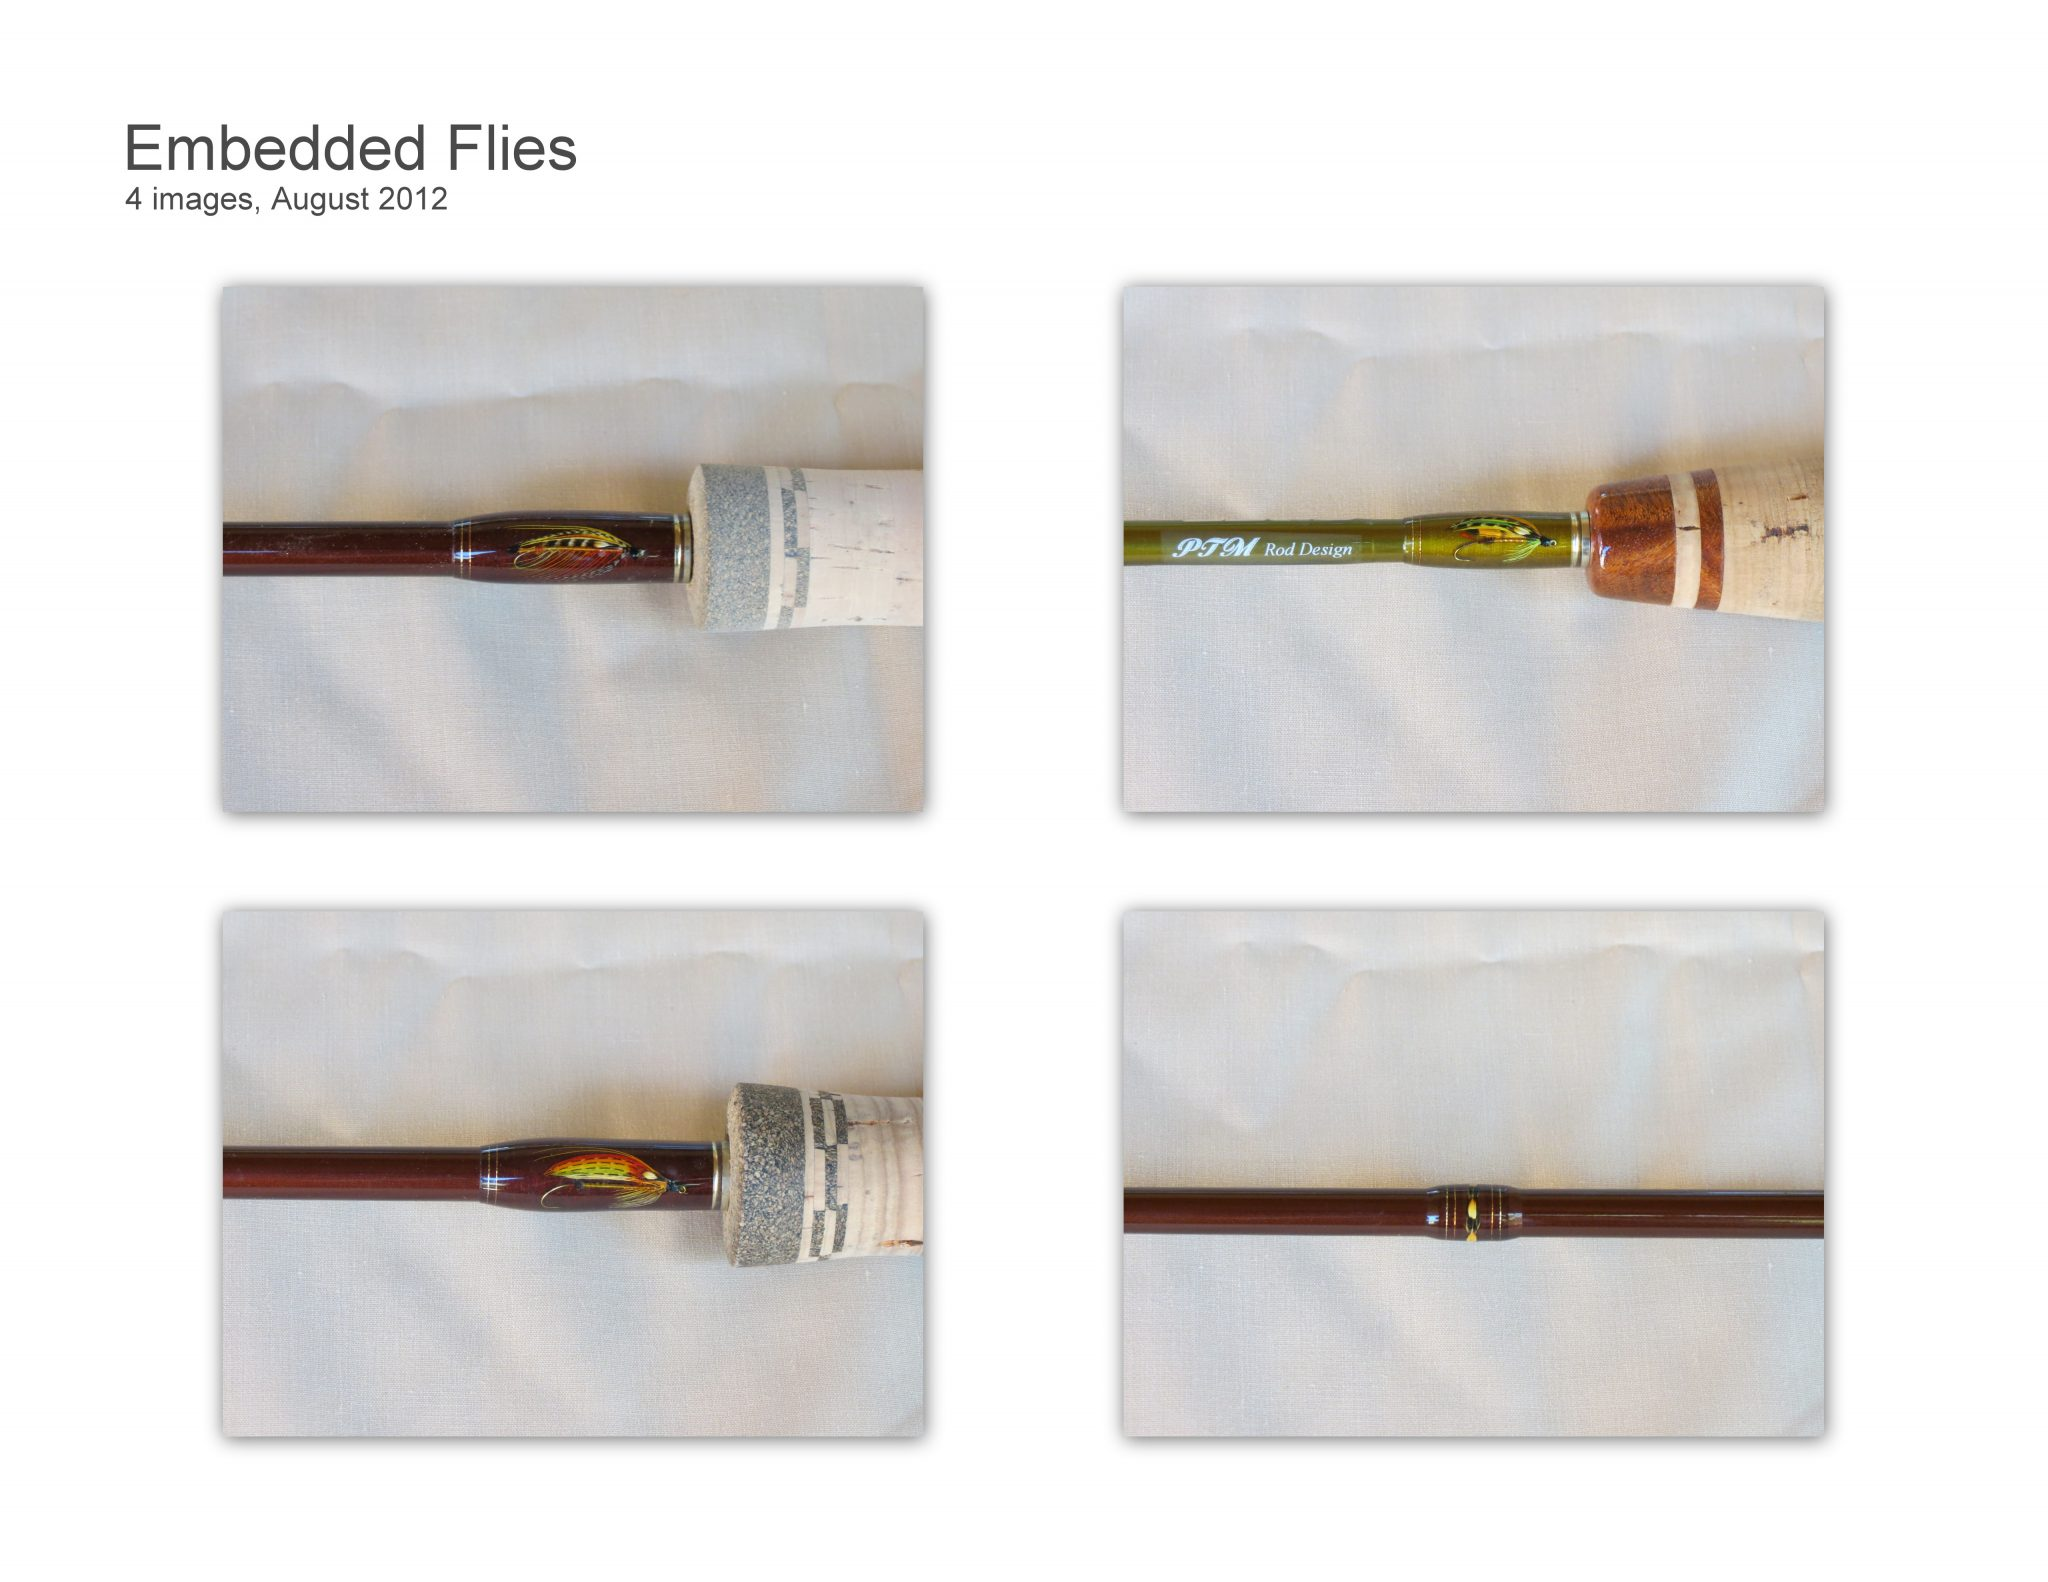 Embedded Flies2